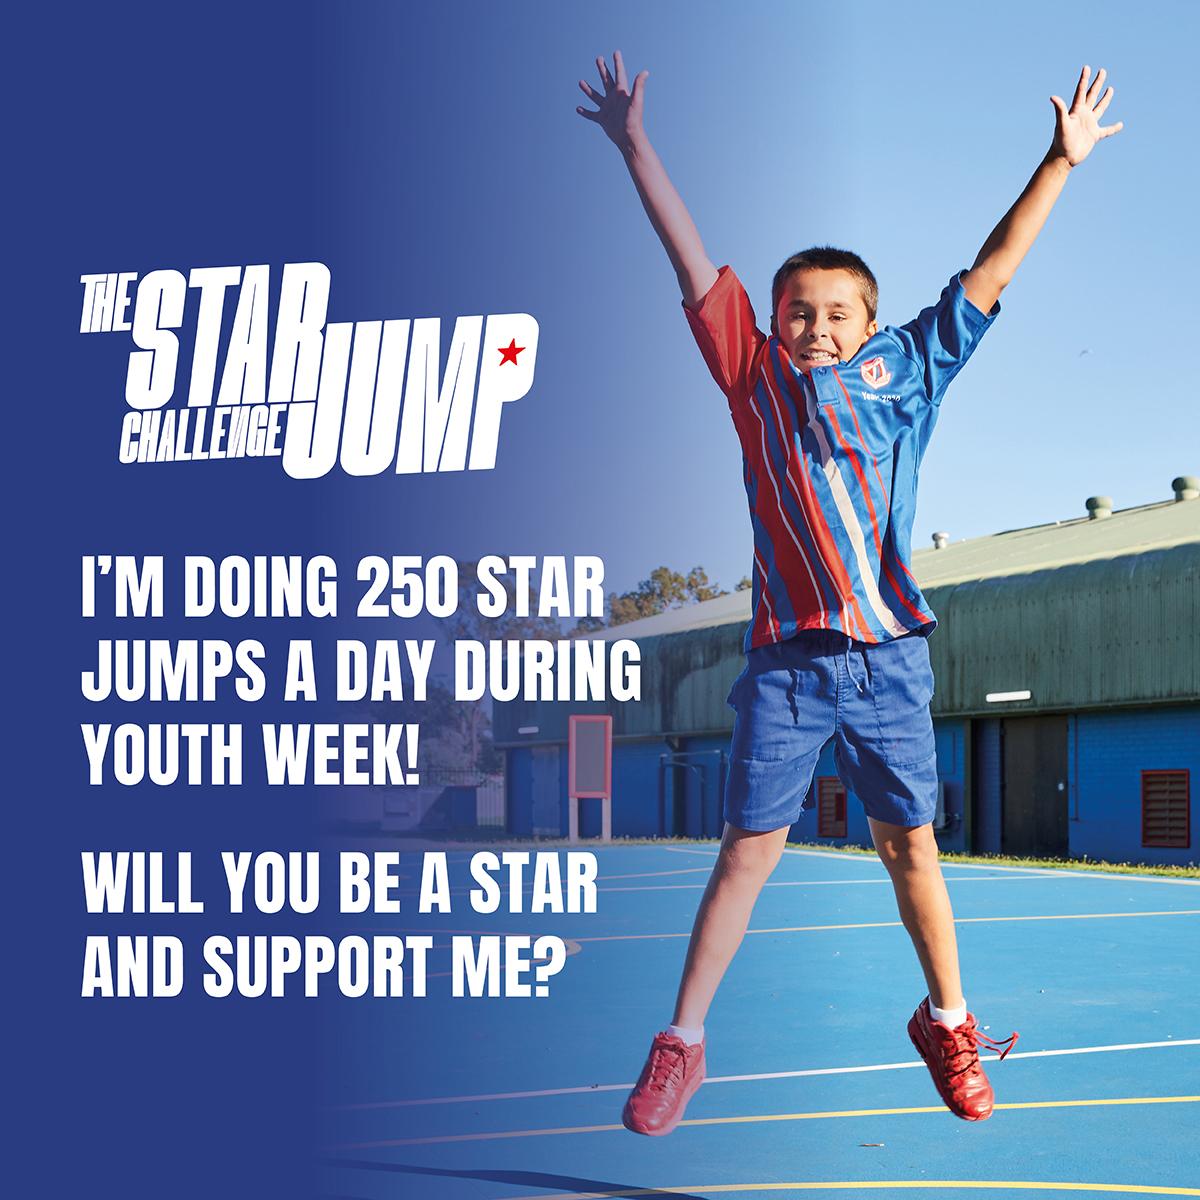 Social Tile 10 - Support - 250 Star Jumps